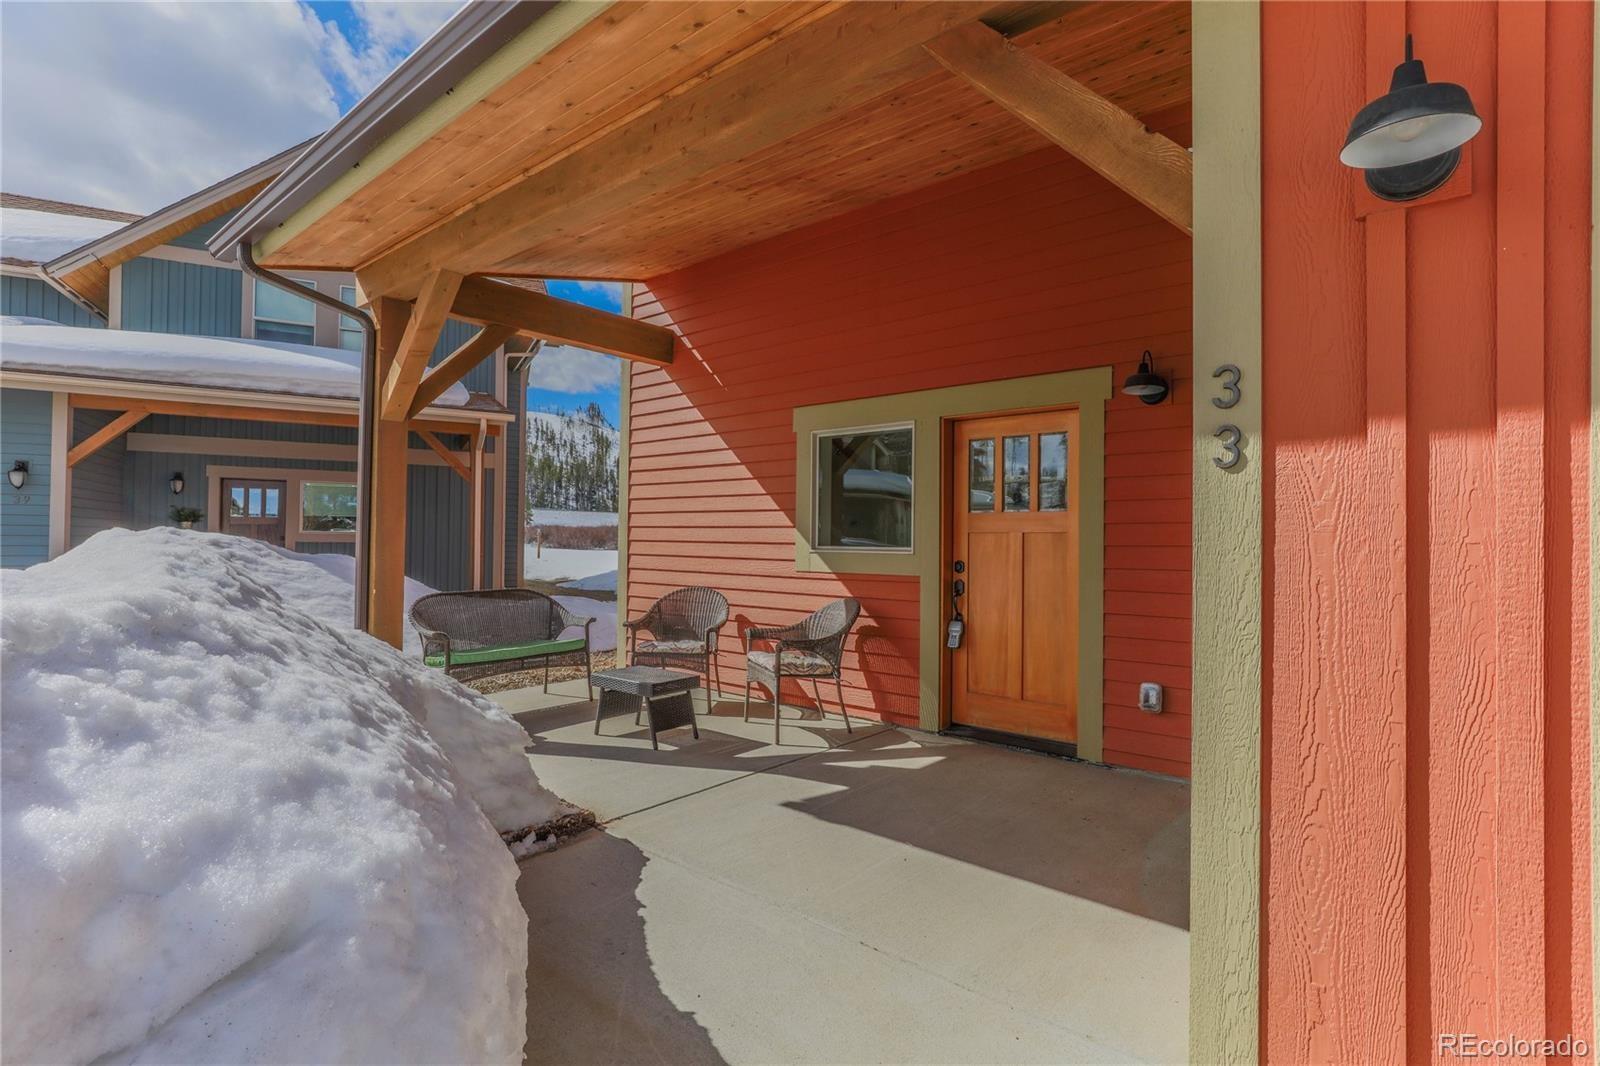 MLS# 4869572 - 29 - 33 Beaver Brook Trail, Fraser, CO 80442